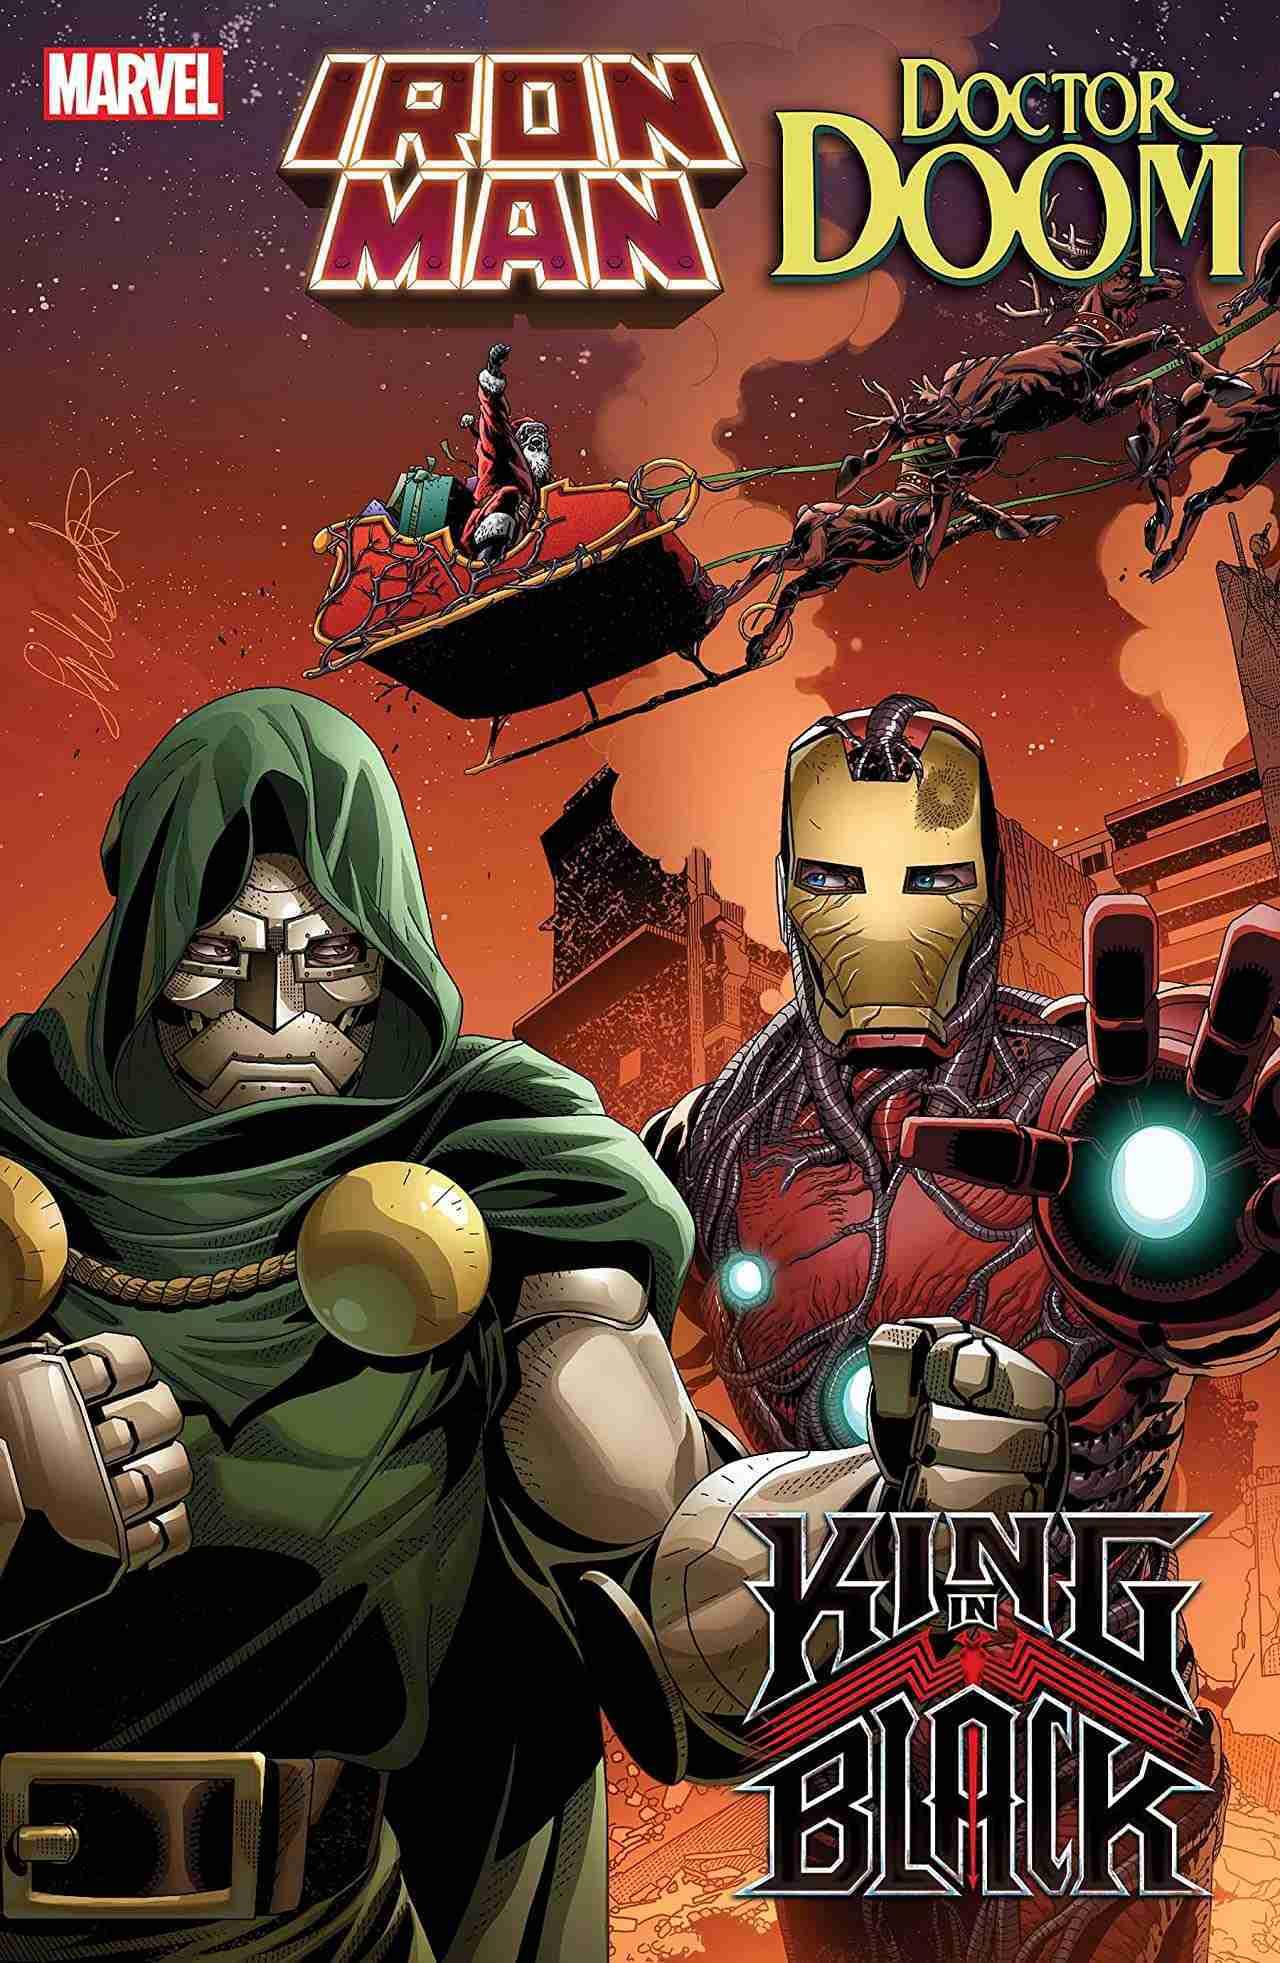 King in Black Iron Mand Doom #1